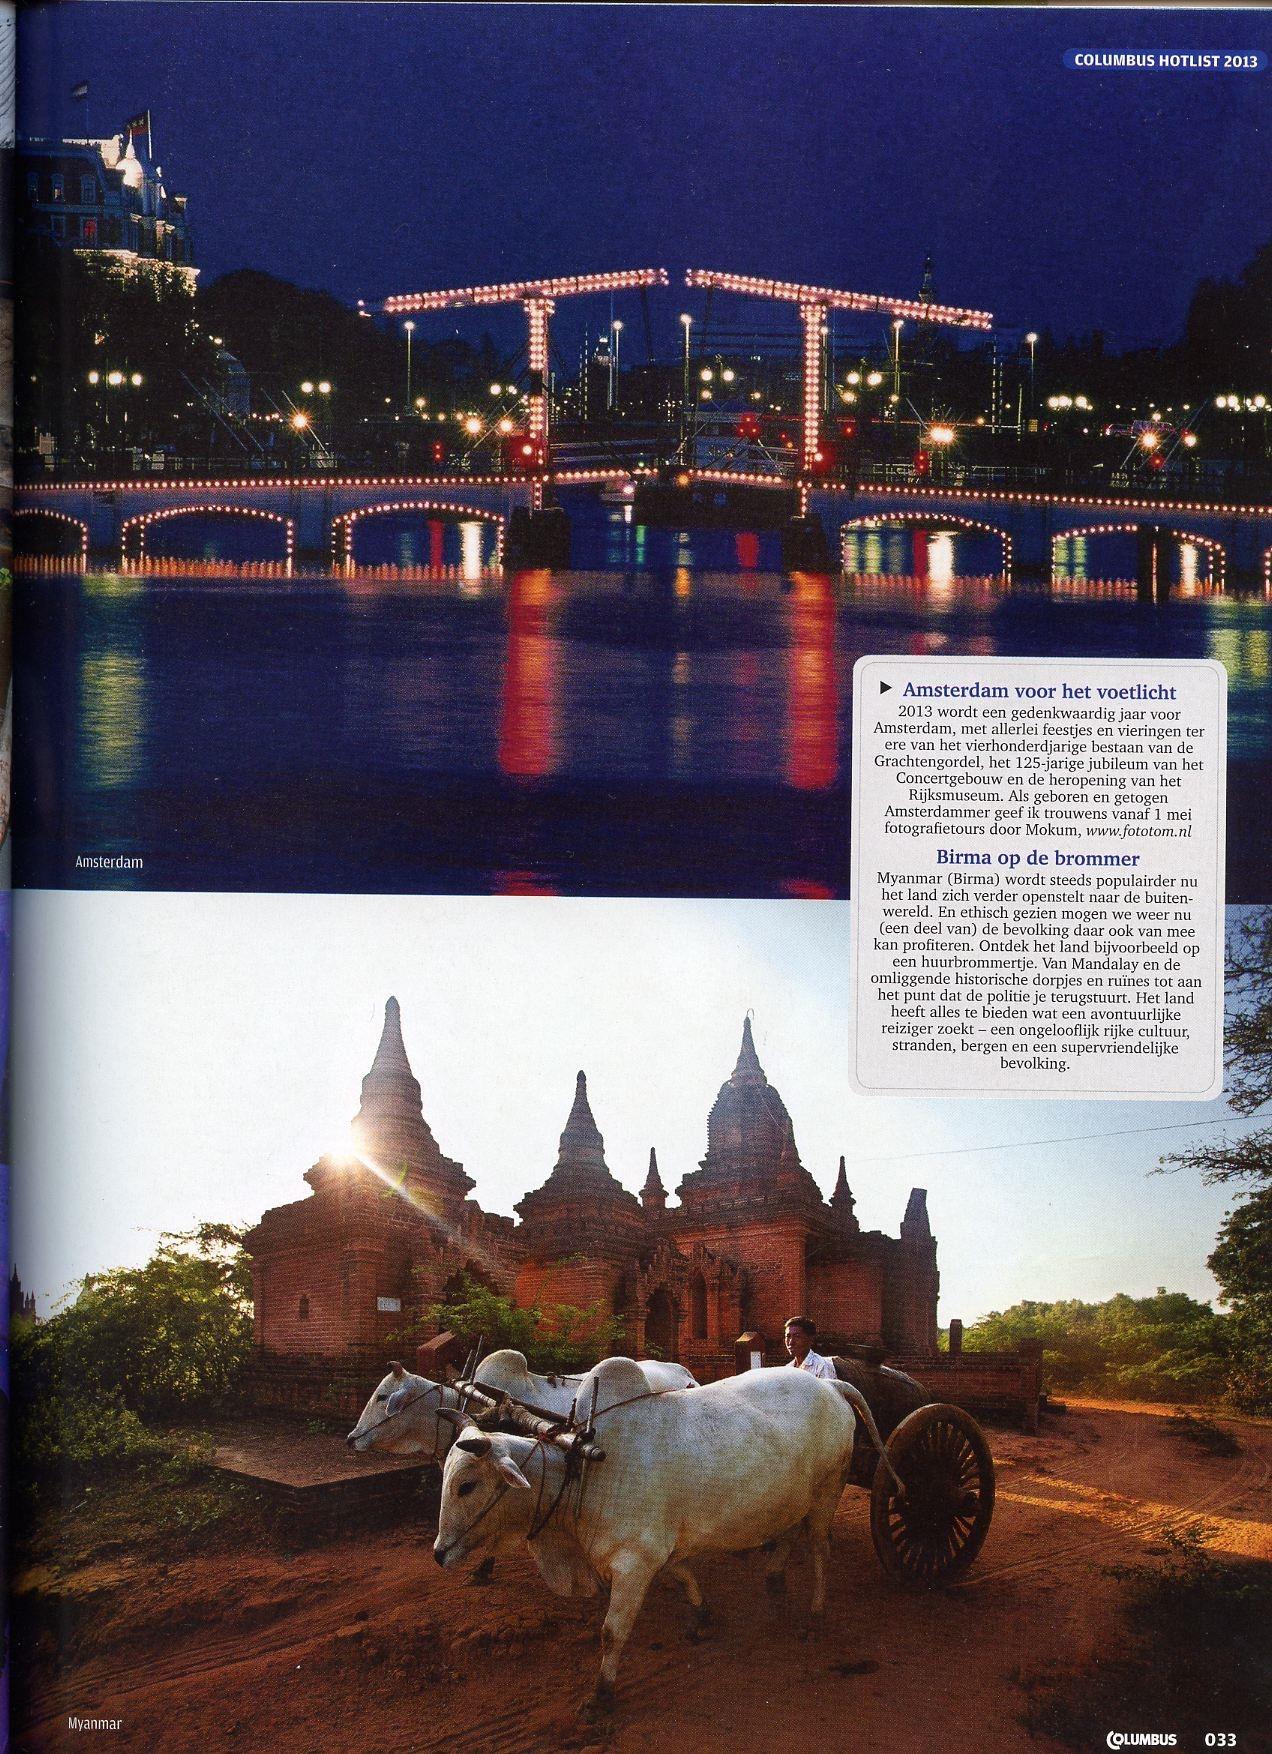 Columbus Magazine, Nº 43, 2013. Phototour by Night.